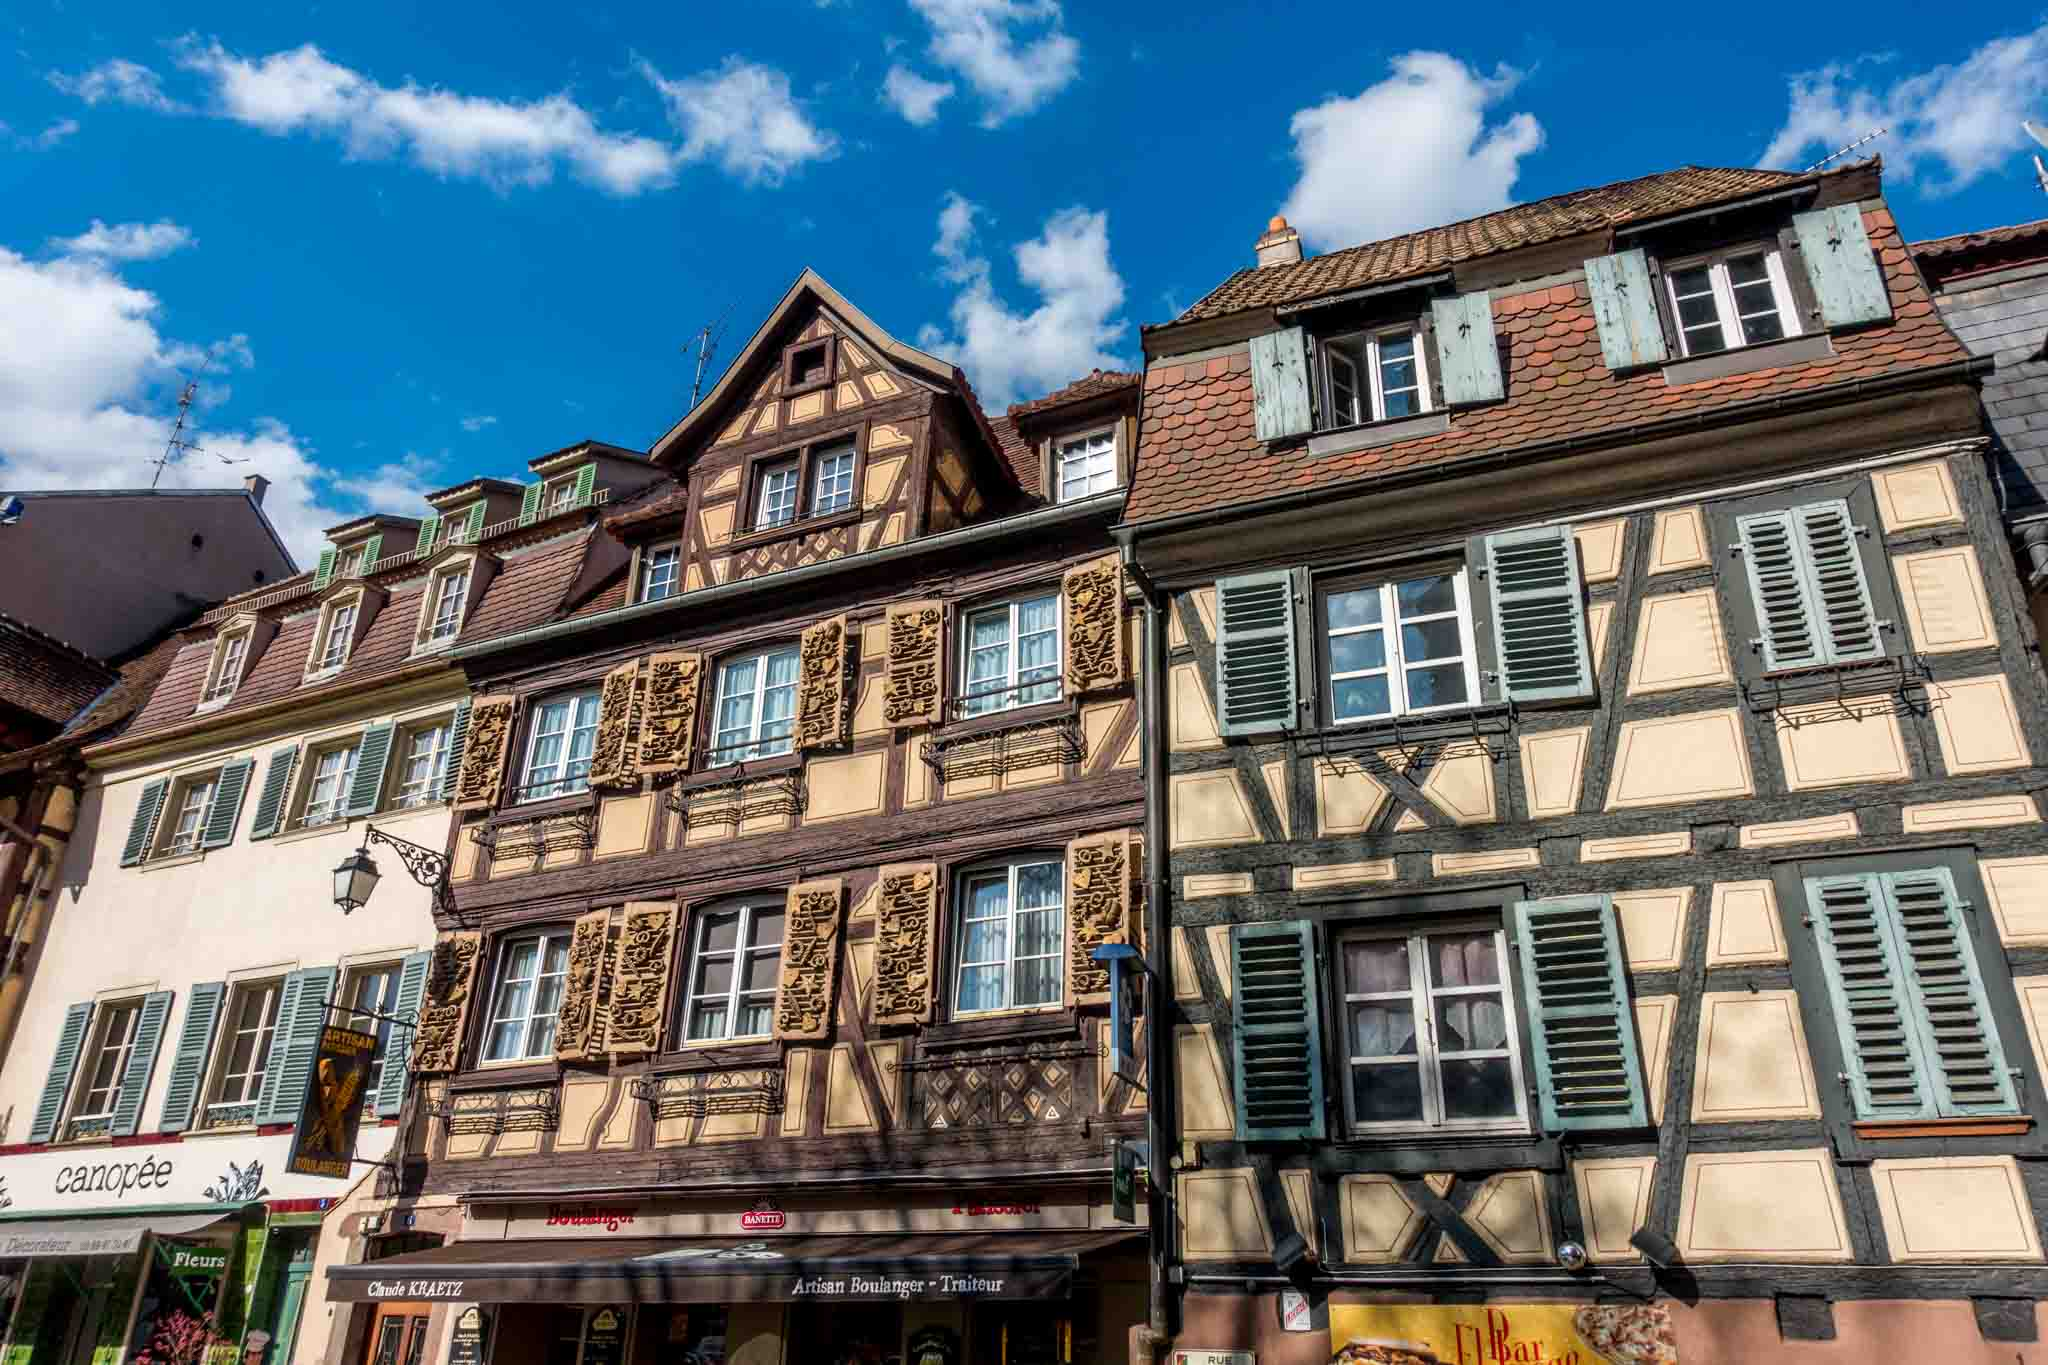 Half-timbered buildings in Colmar